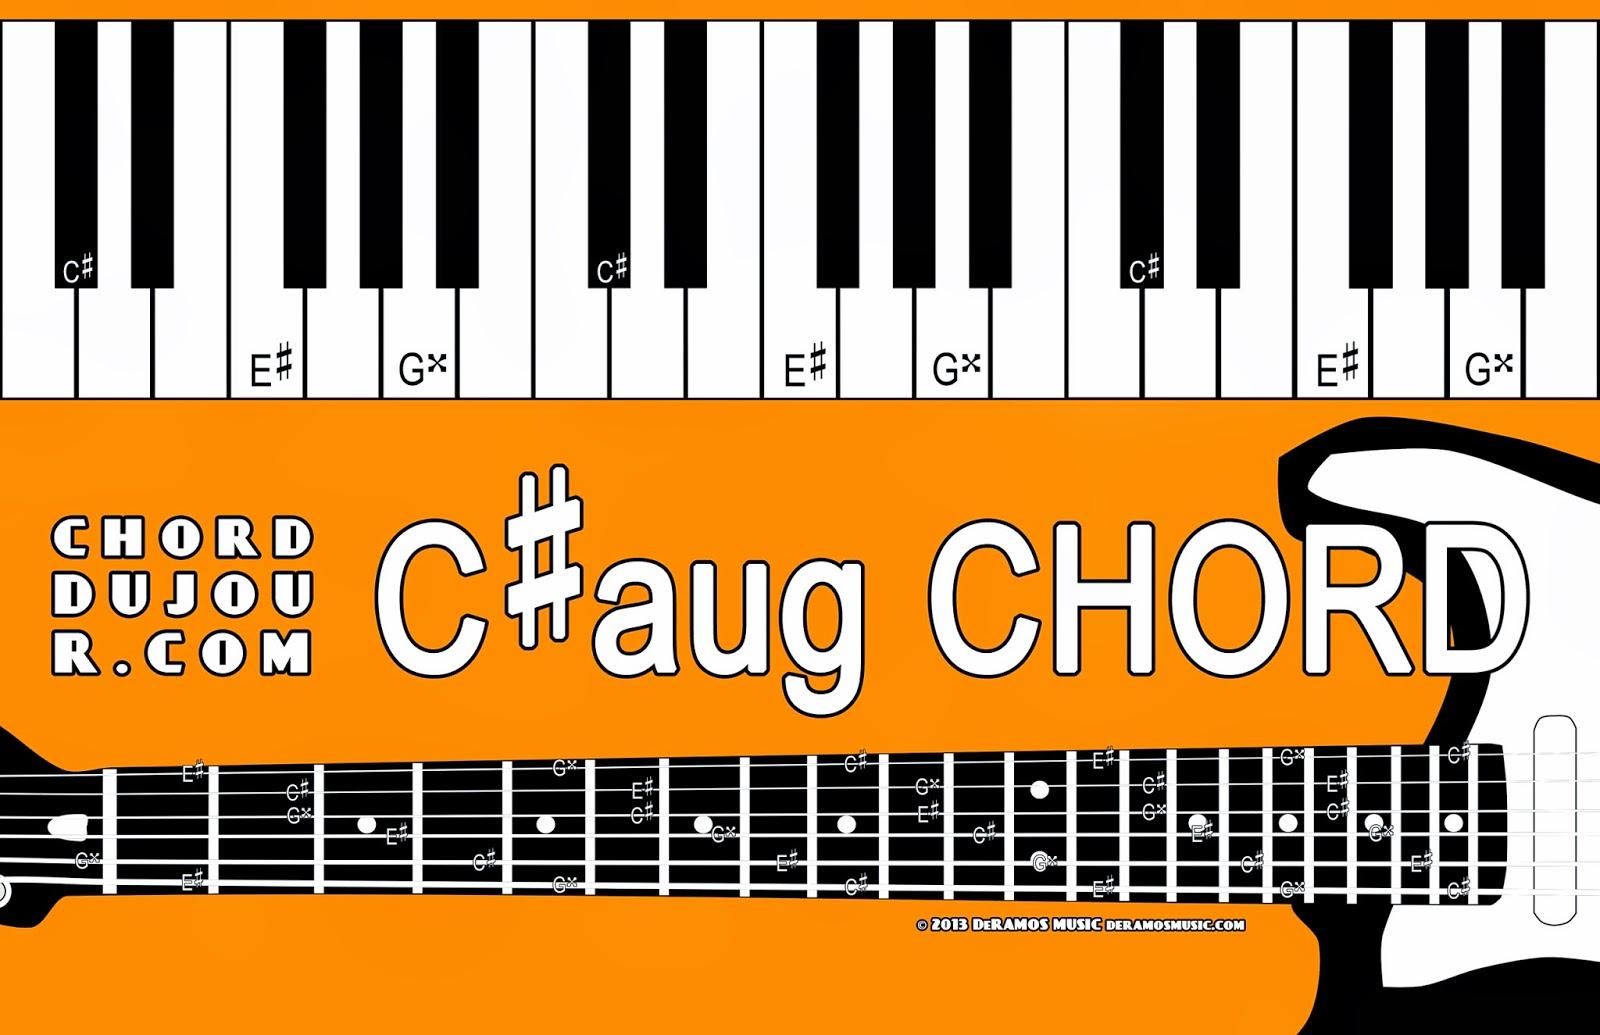 Chord Du Jour Dictionary Caug Chord